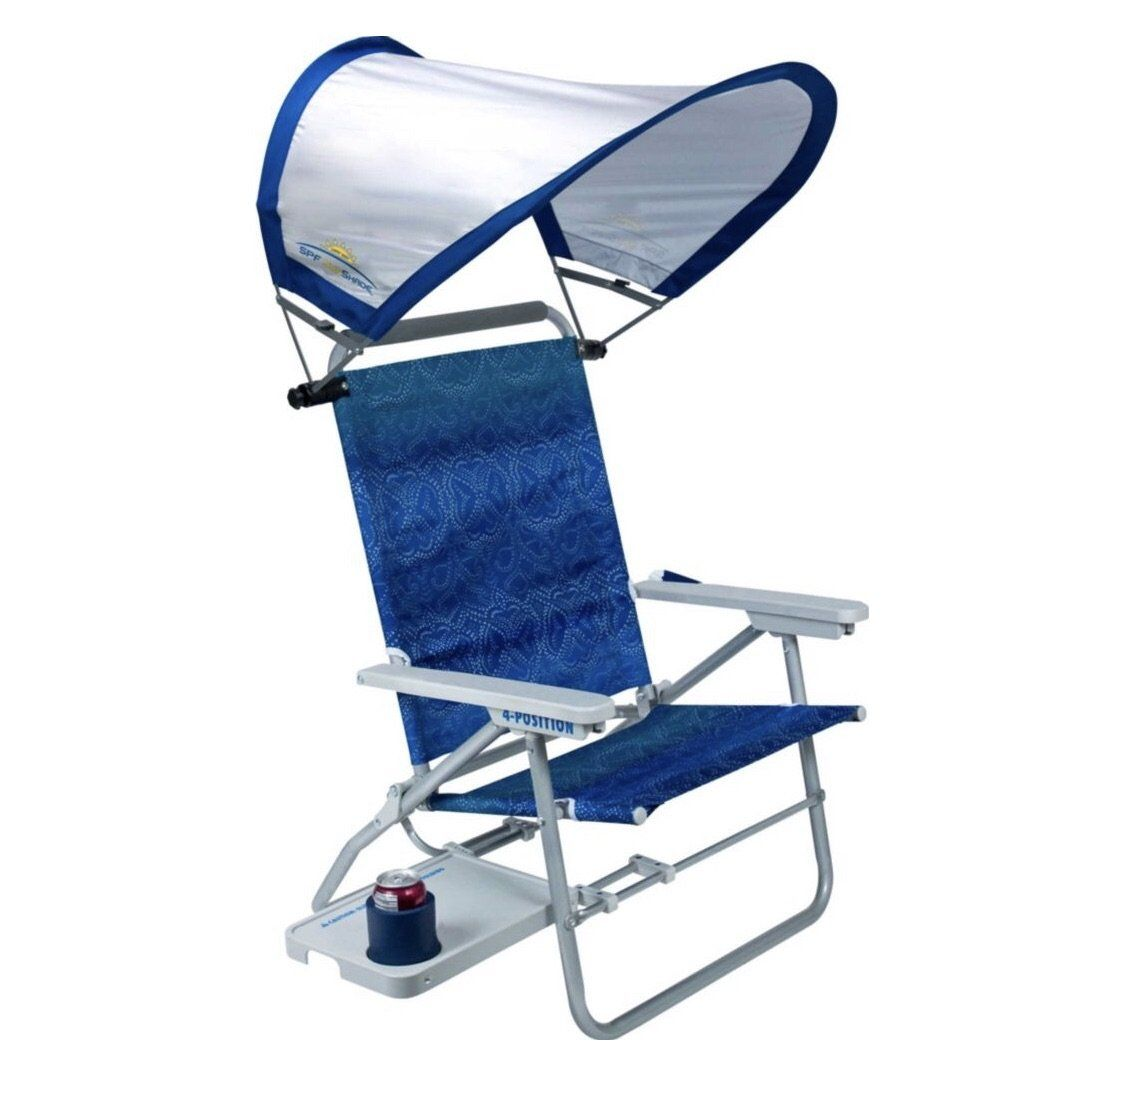 GCI Waterside Big Surf Beach Chair with SunShade Beach